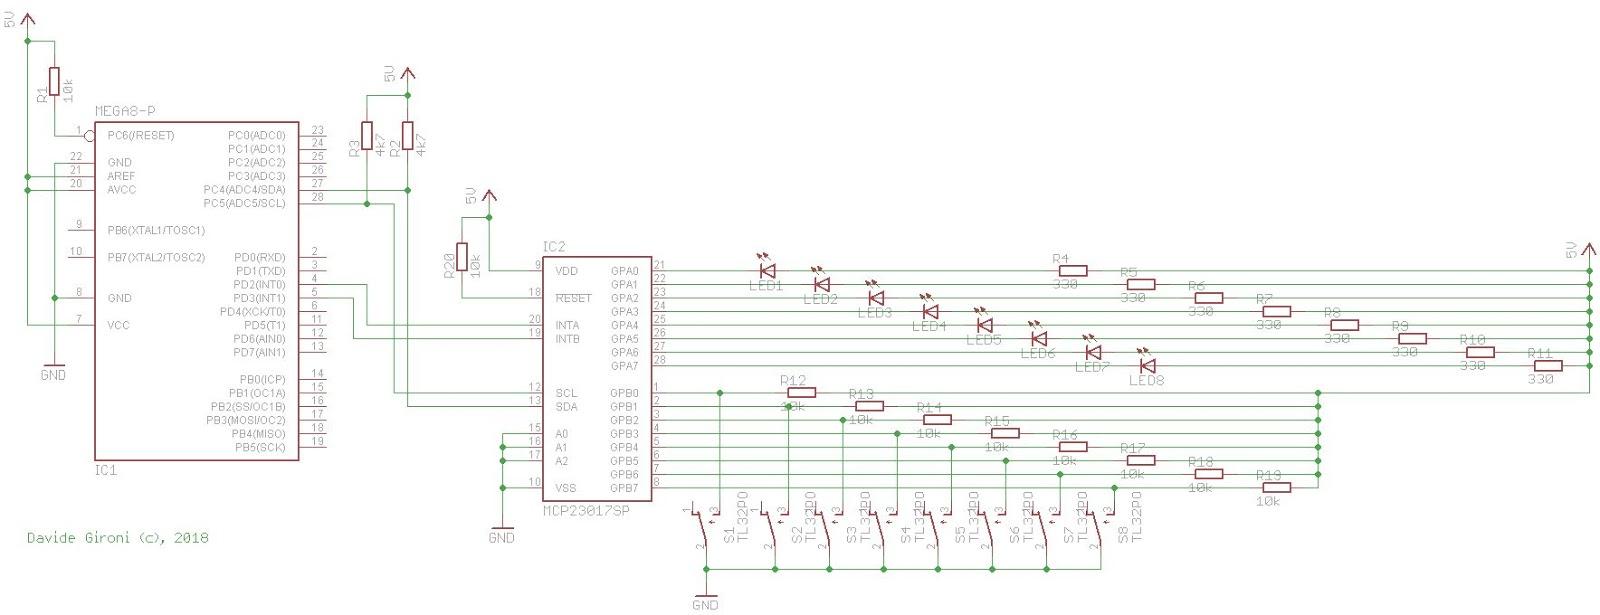 davide gironi  usa a mcp23017 gpio port expander with an atmega